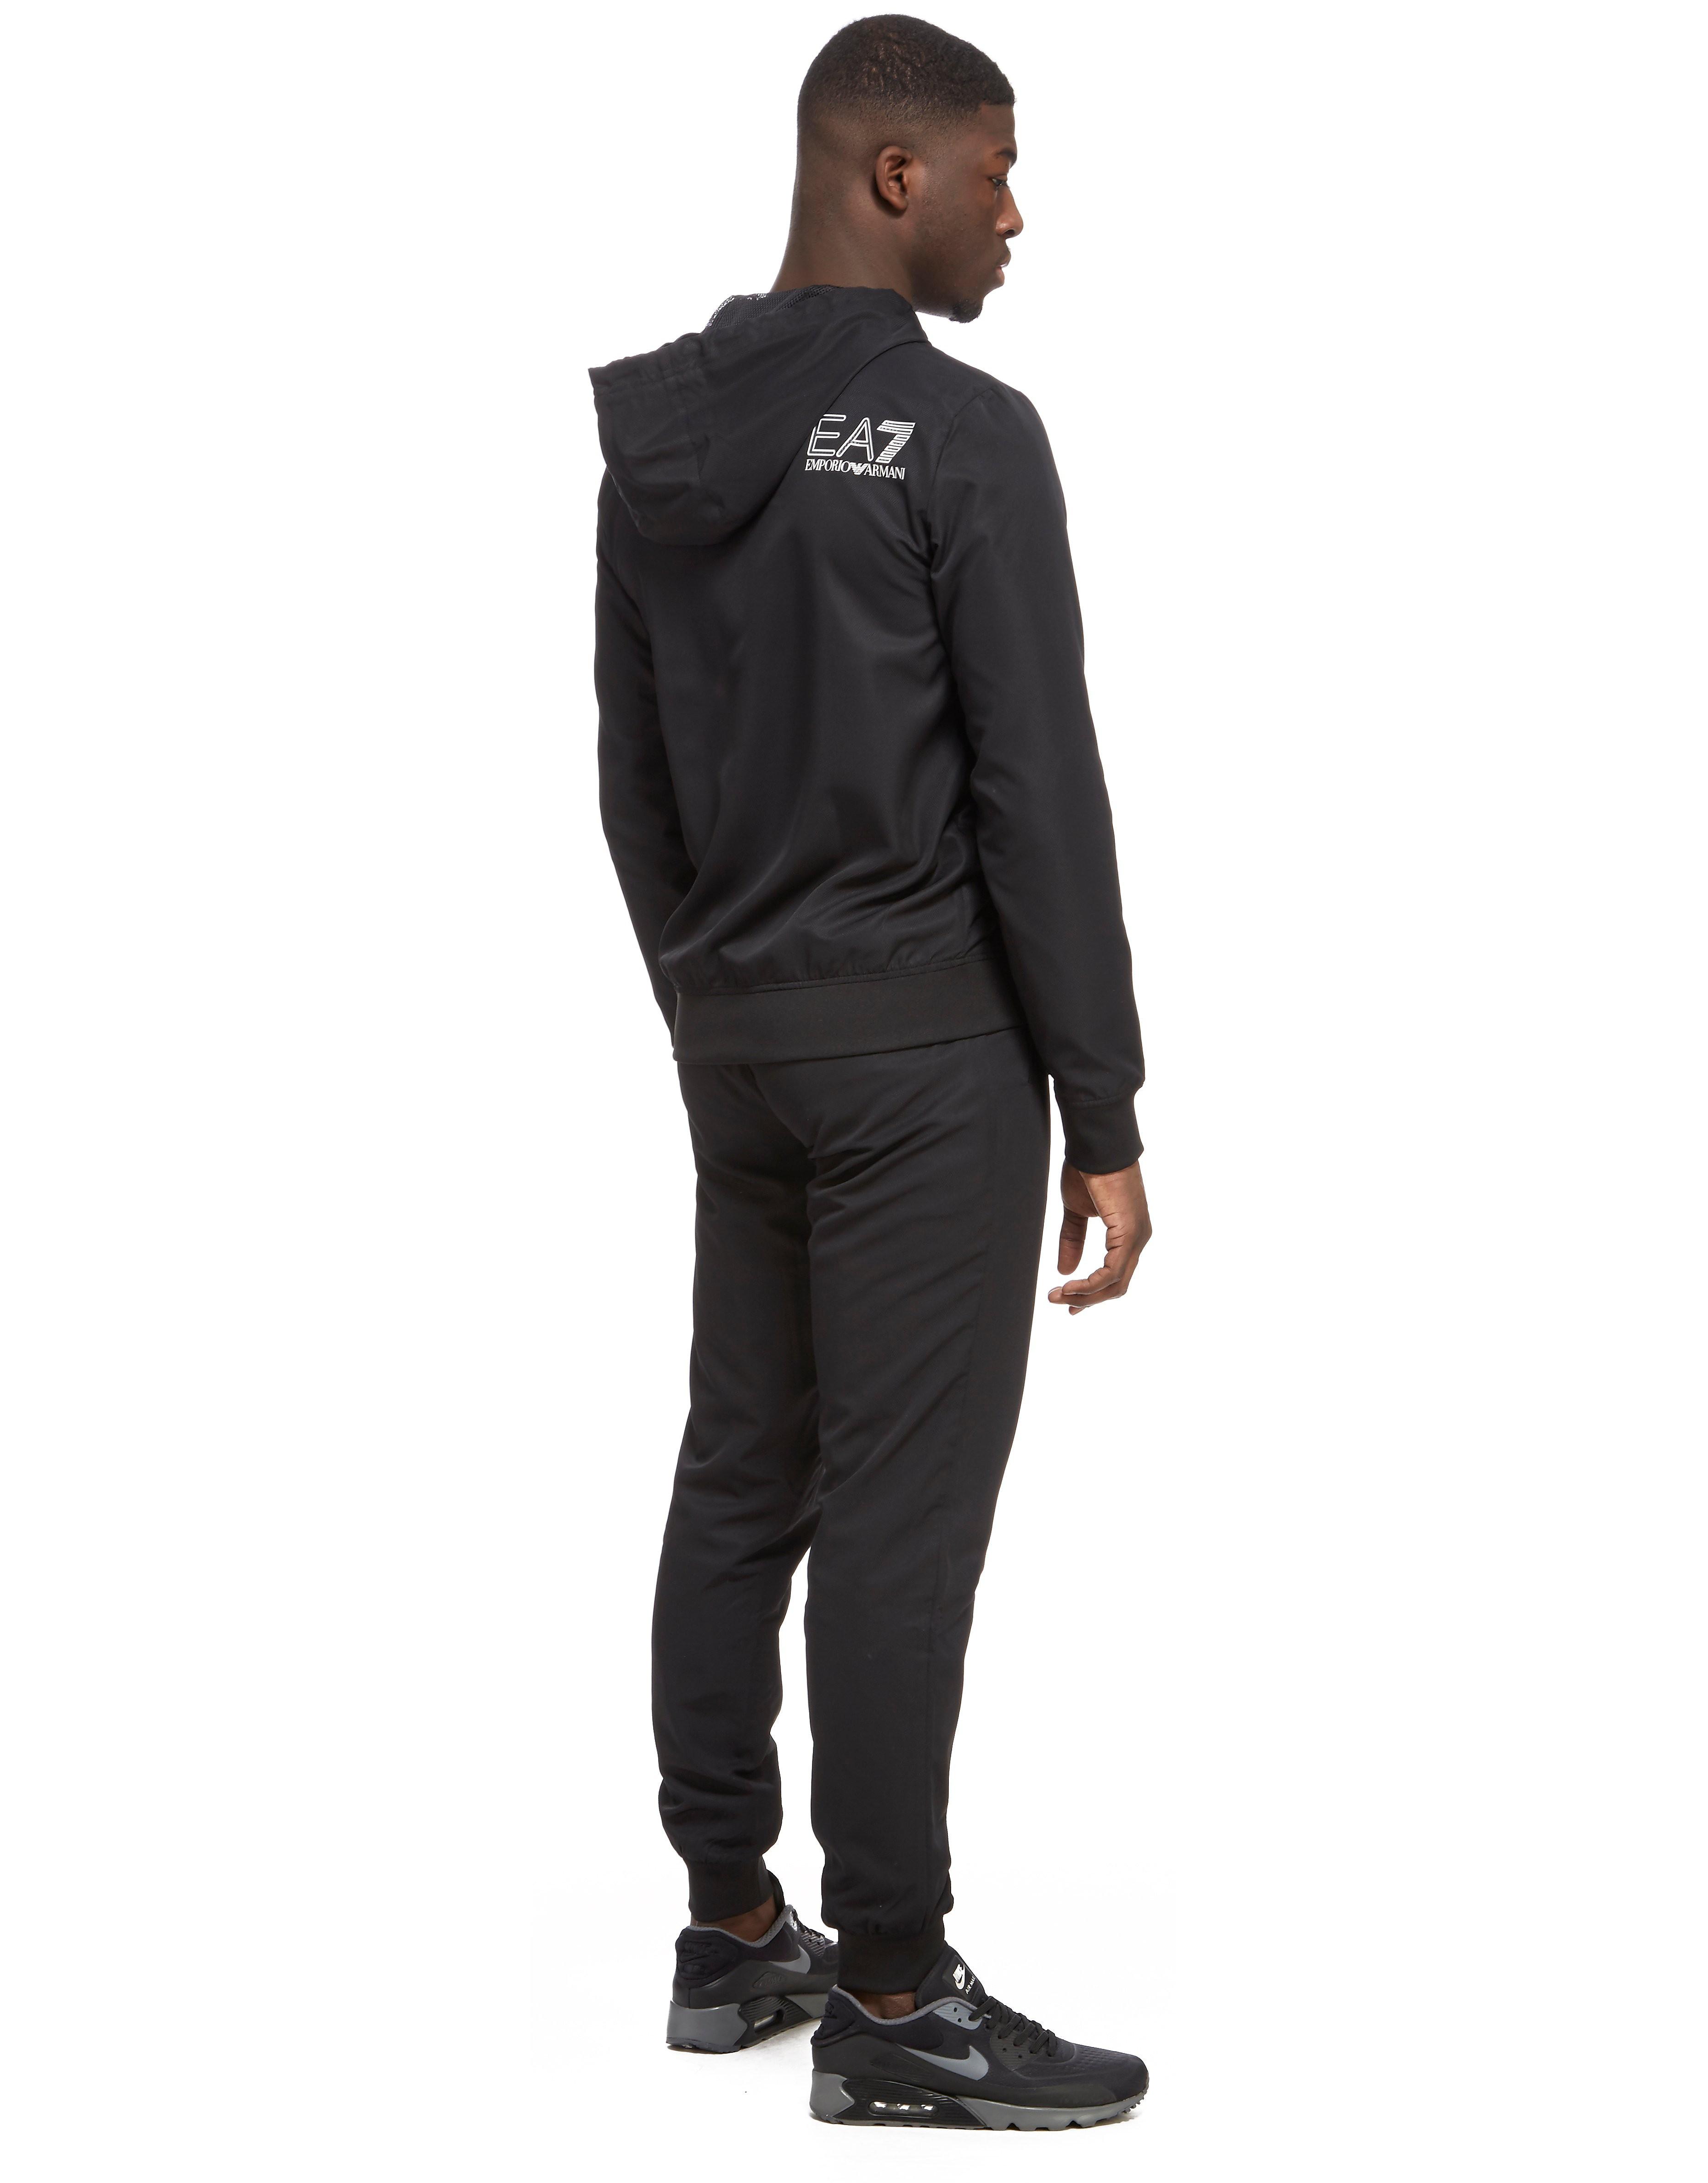 Emporio Armani EA7 Woven Hooded Track Suit